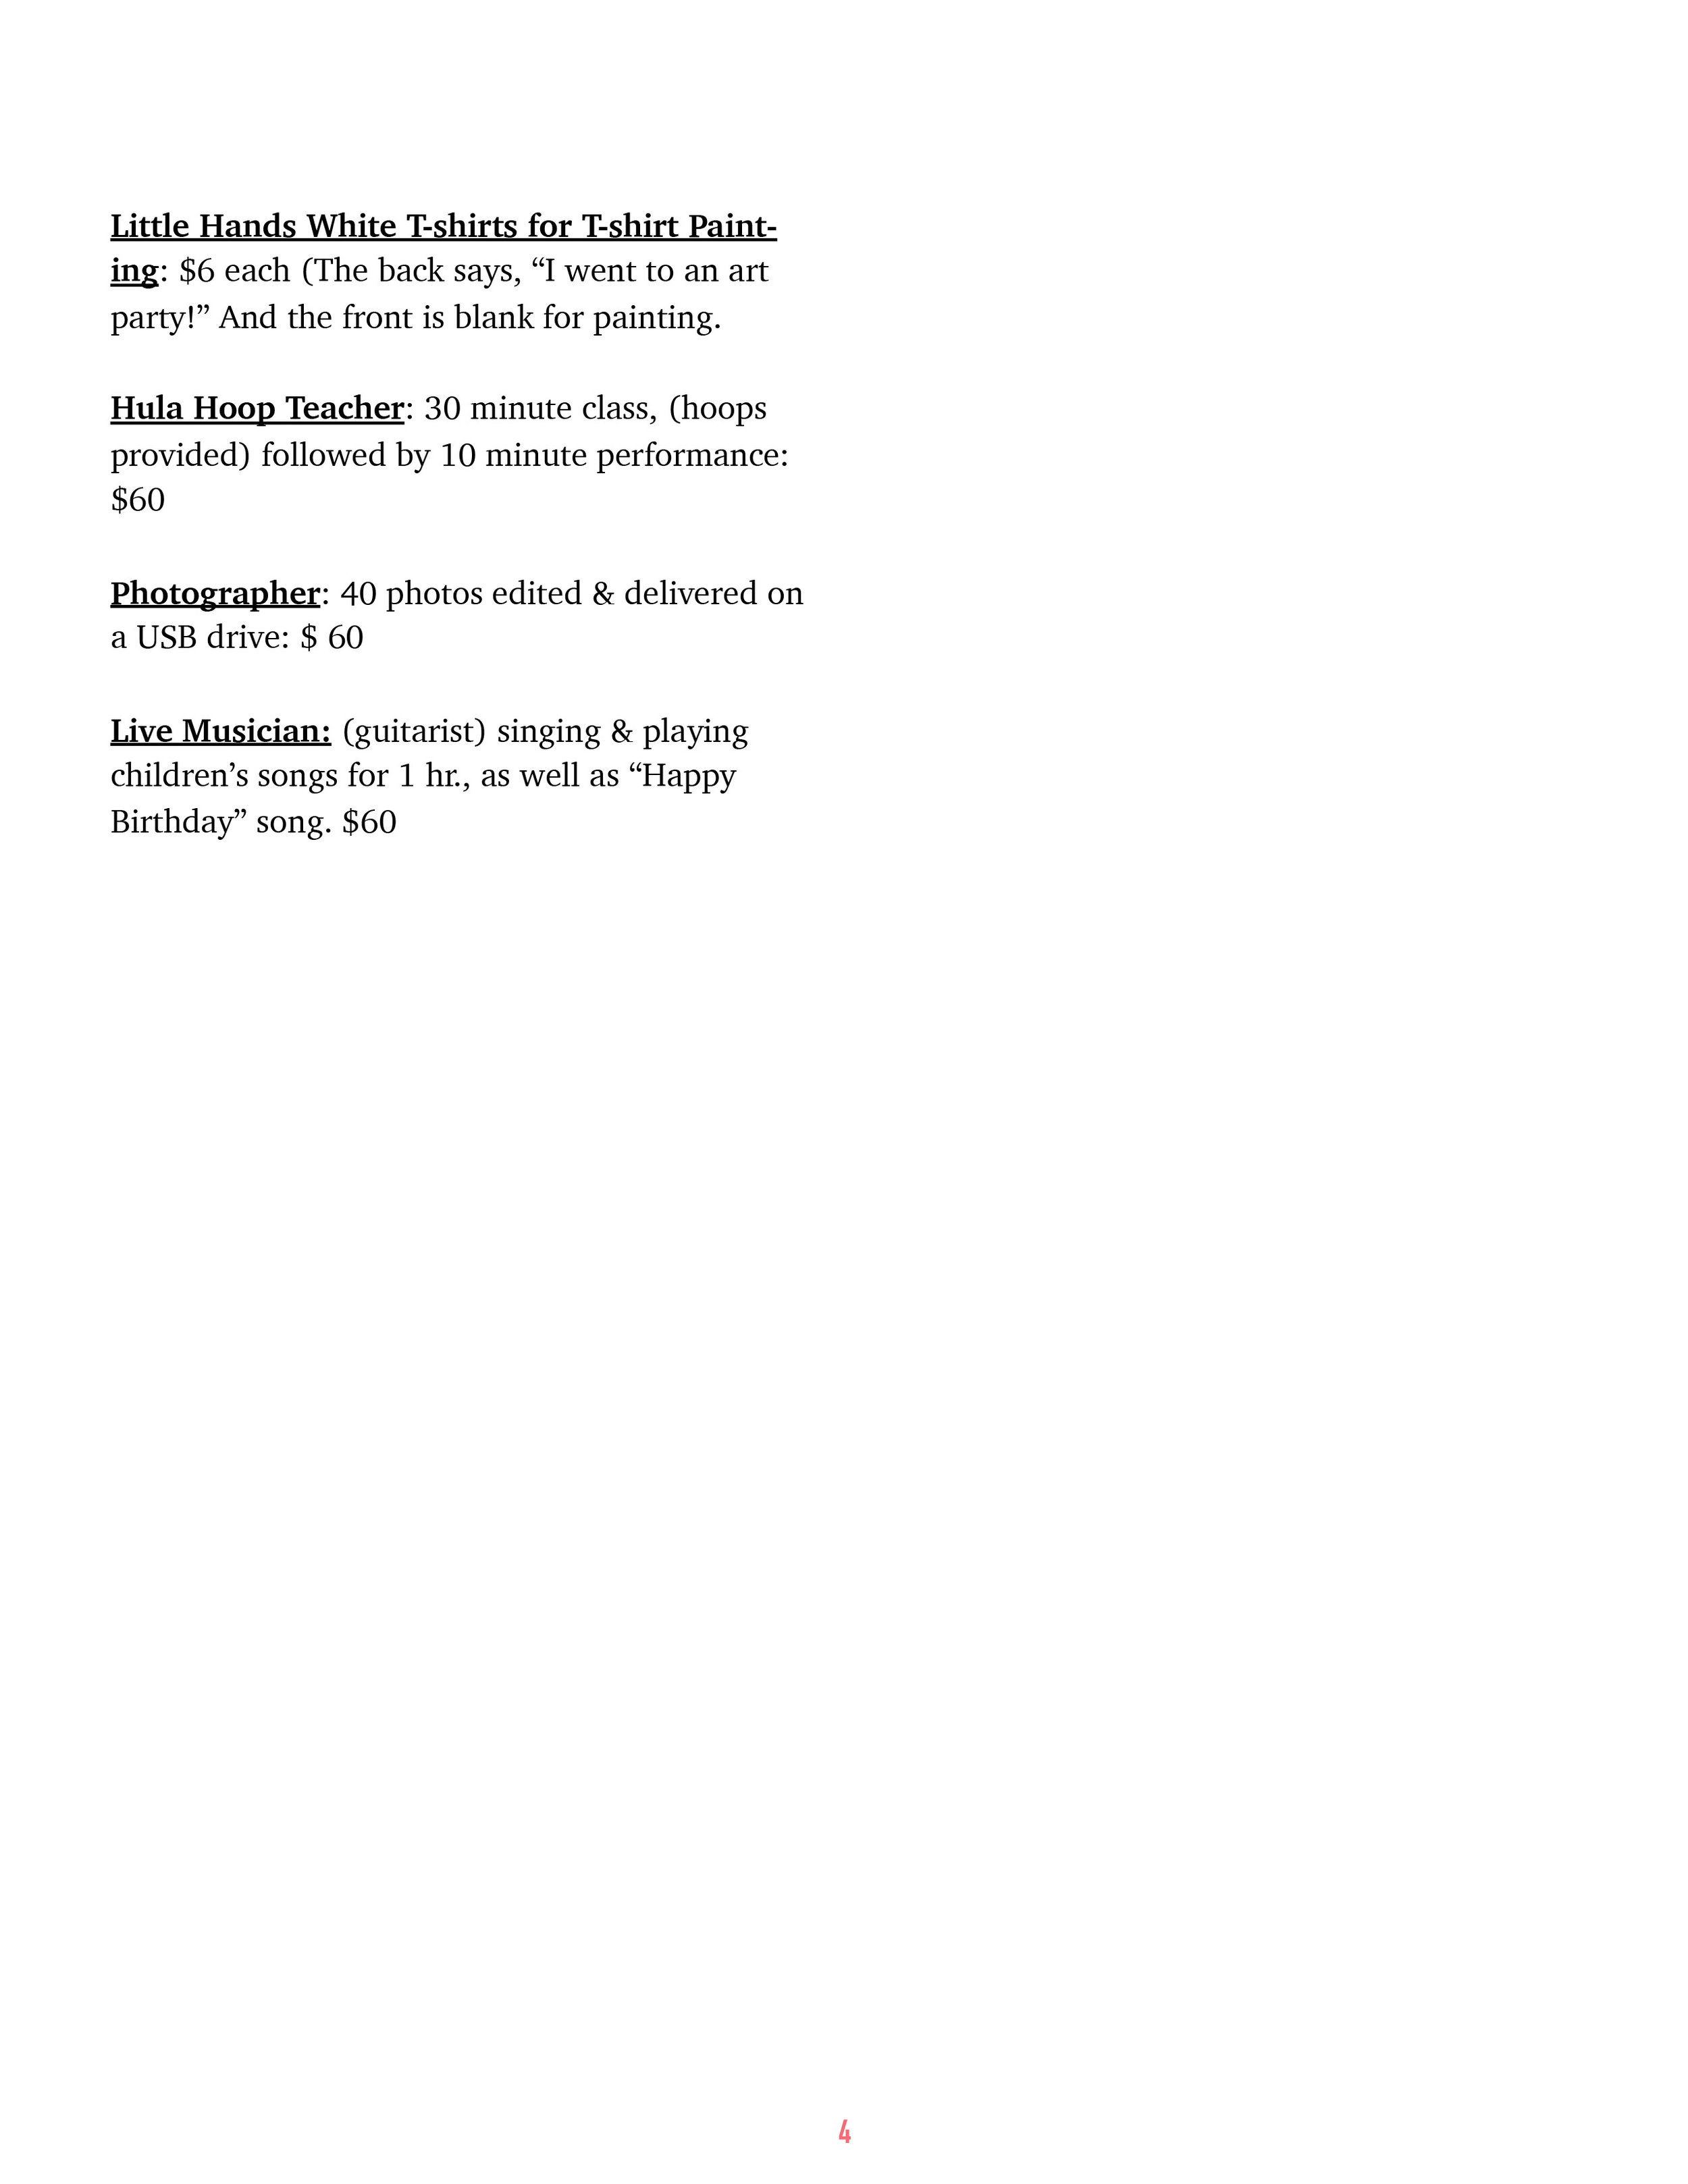 Birthday Handout Info-web-4.jpg